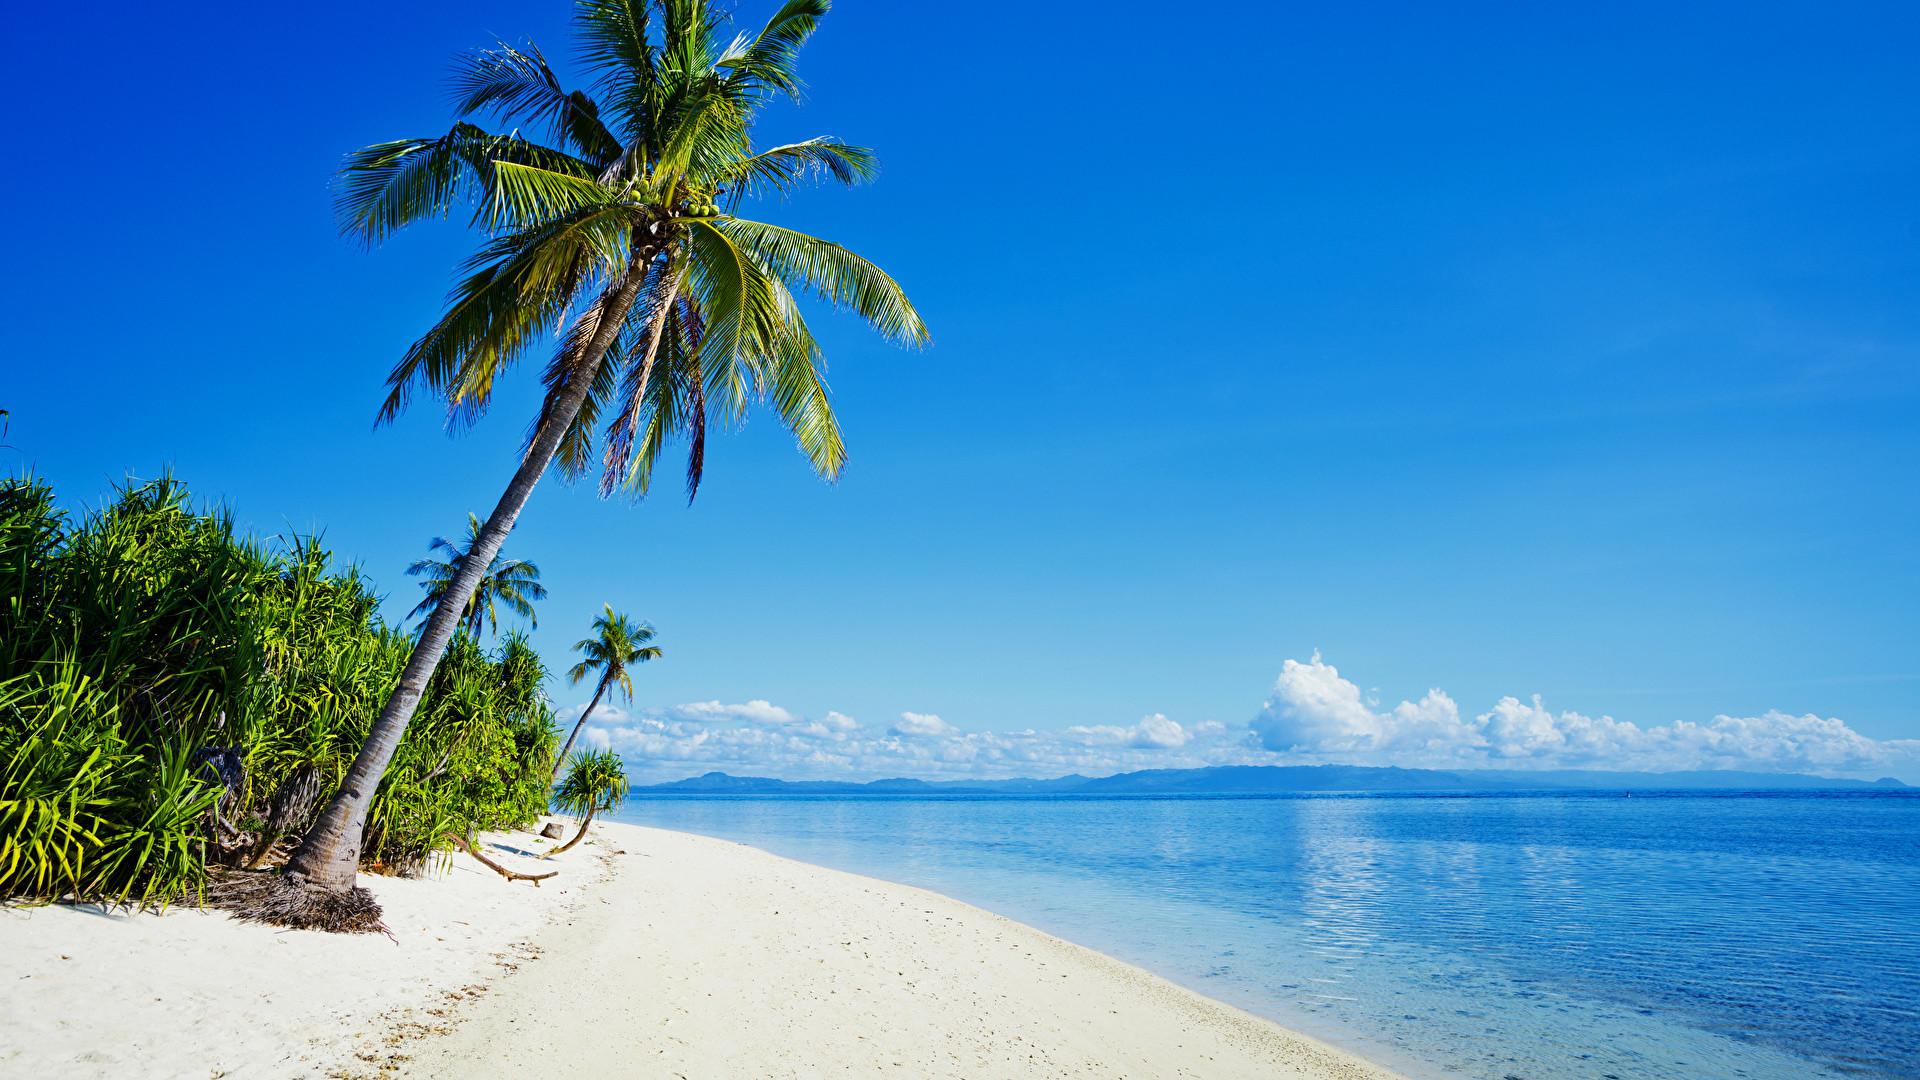 Shore Palms Tropical Beach 4k Hd Desktop Wallpaper For 4k: Tropical Wallpaper Desktop ·① WallpaperTag